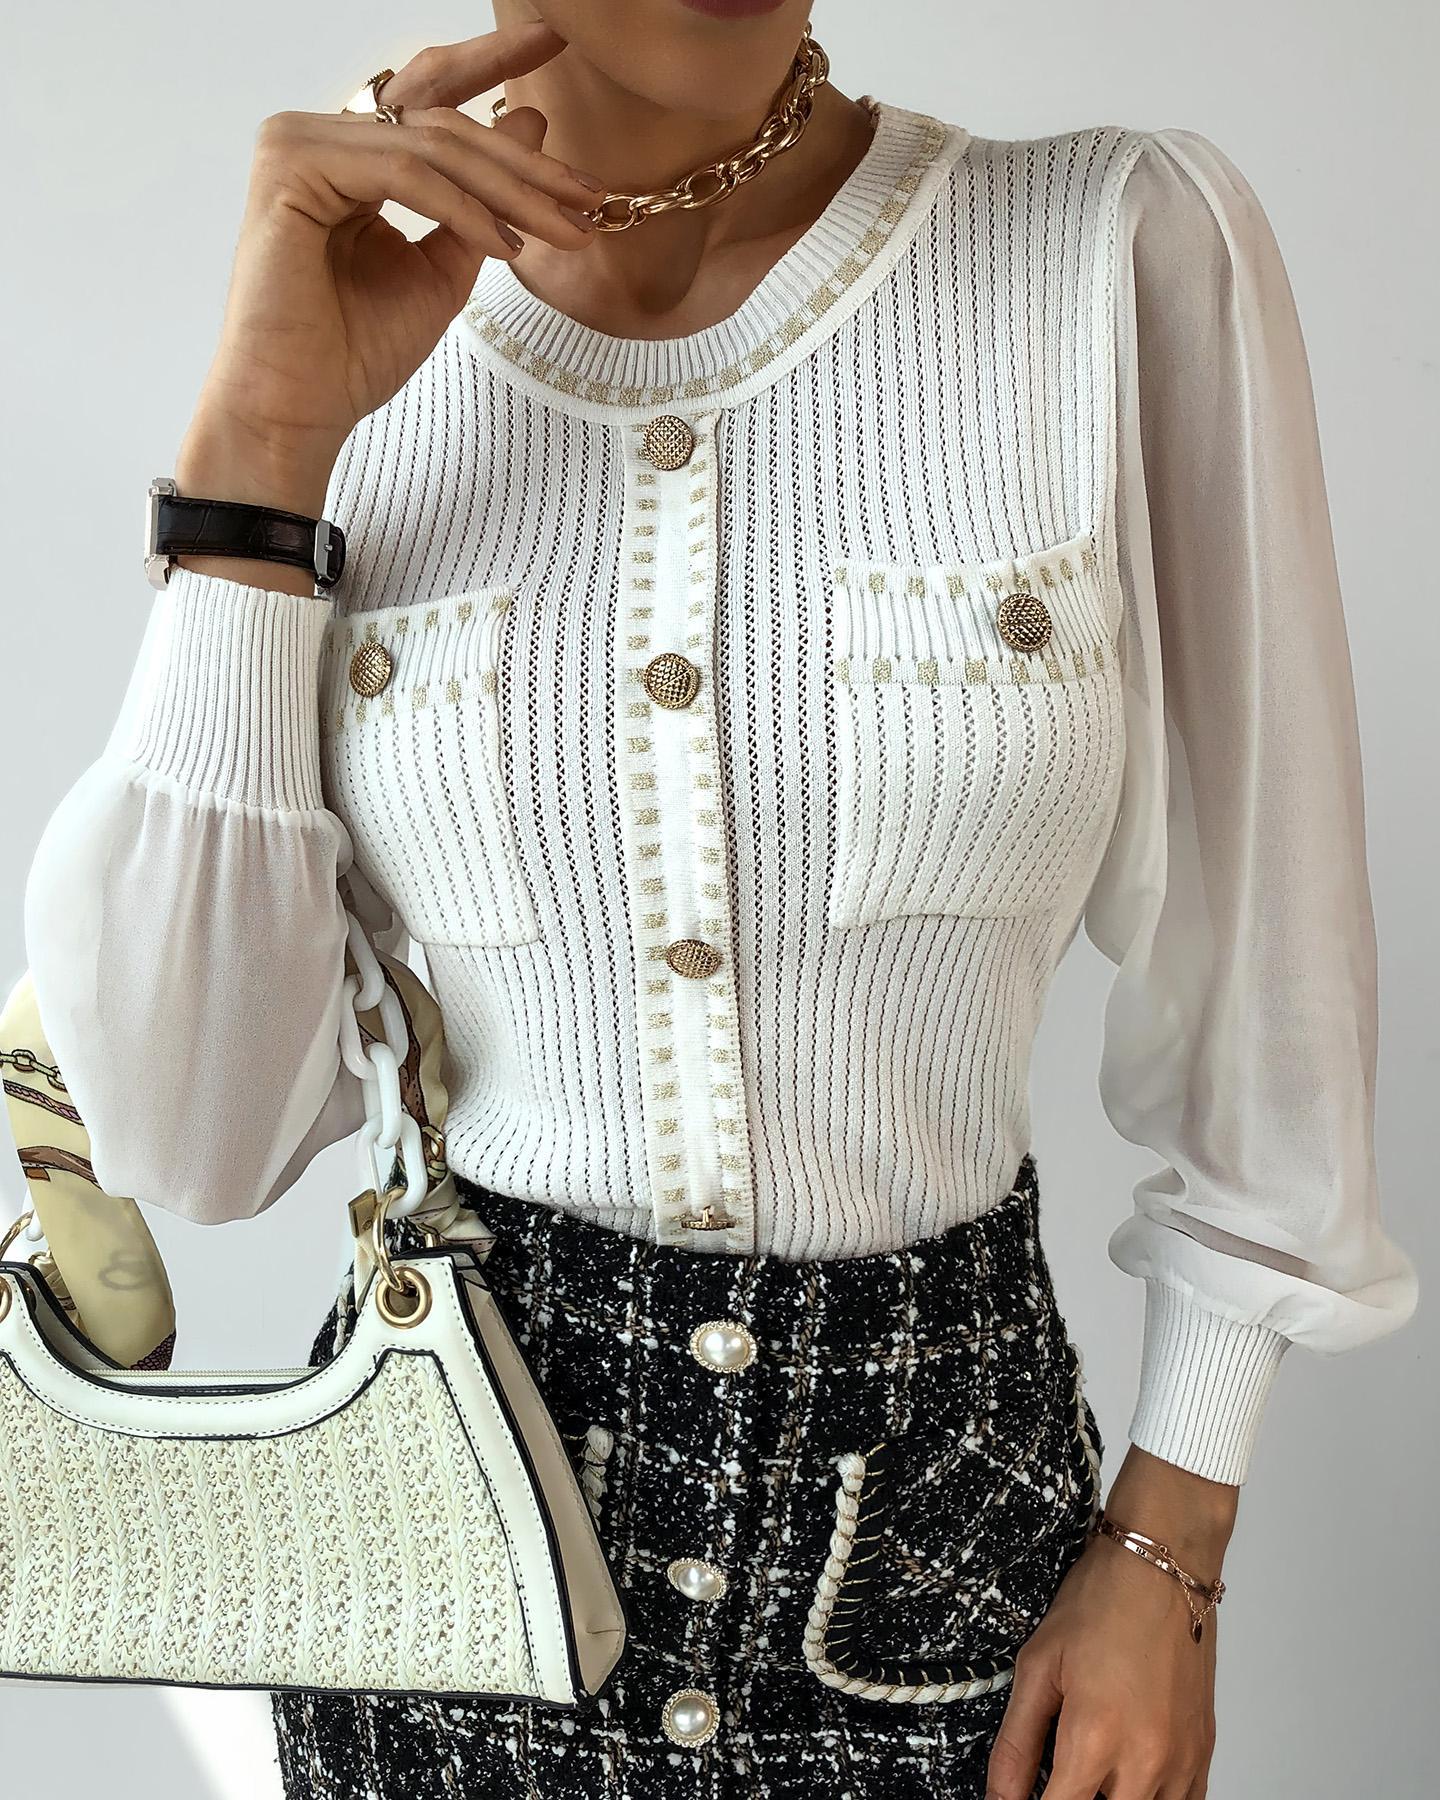 boutiquefeel / Suéter de malla transparente con diseño de bolsillos abotonados